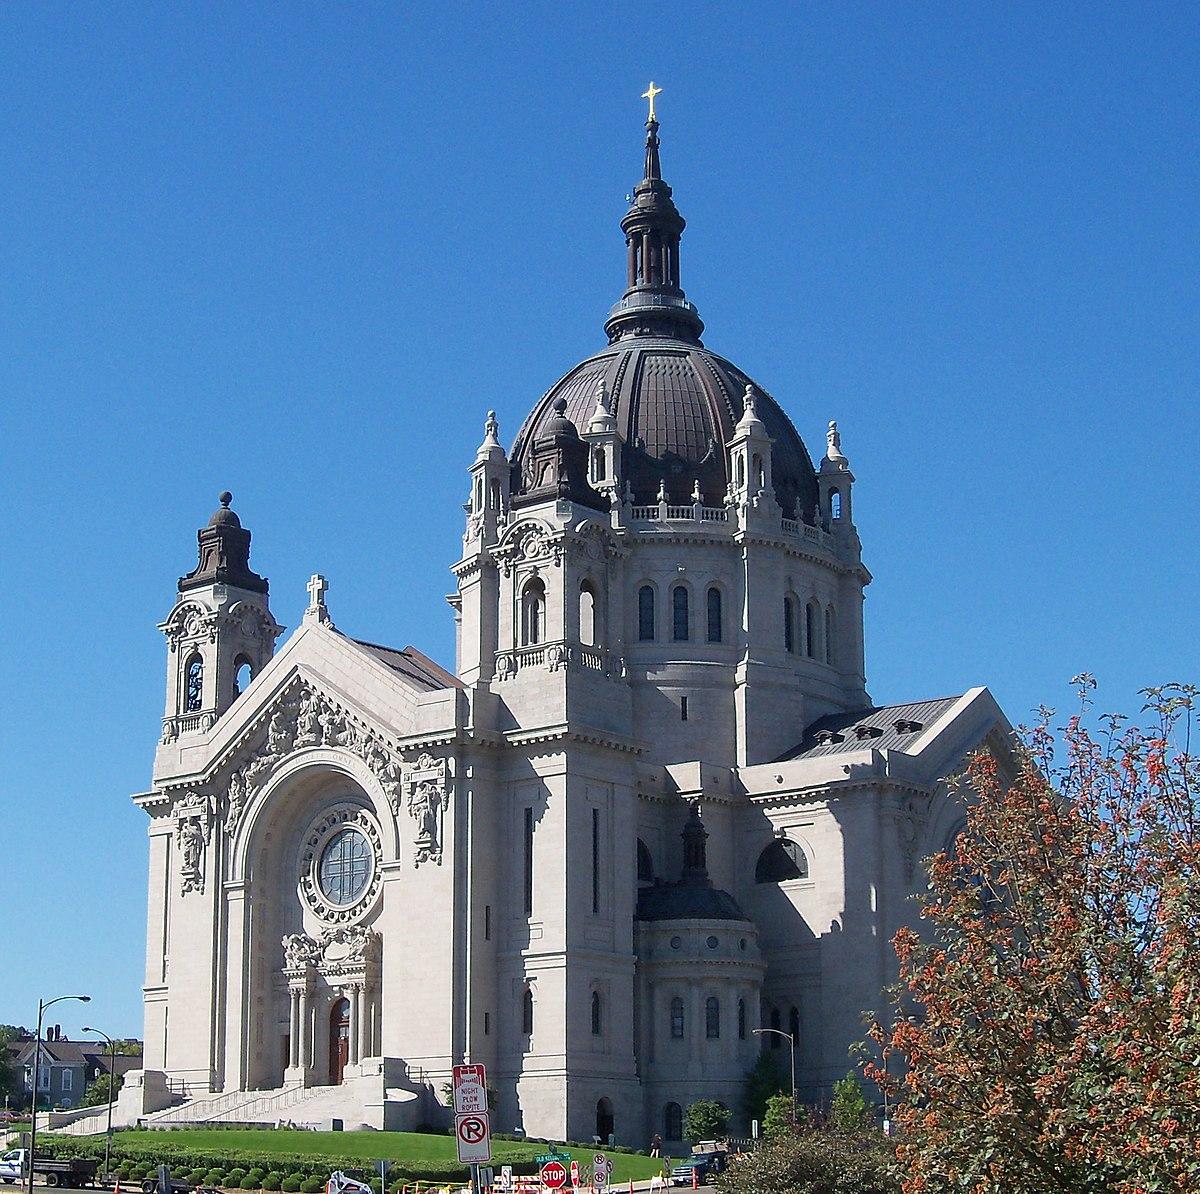 Kathedraal Van Saint Paul Wikipedia